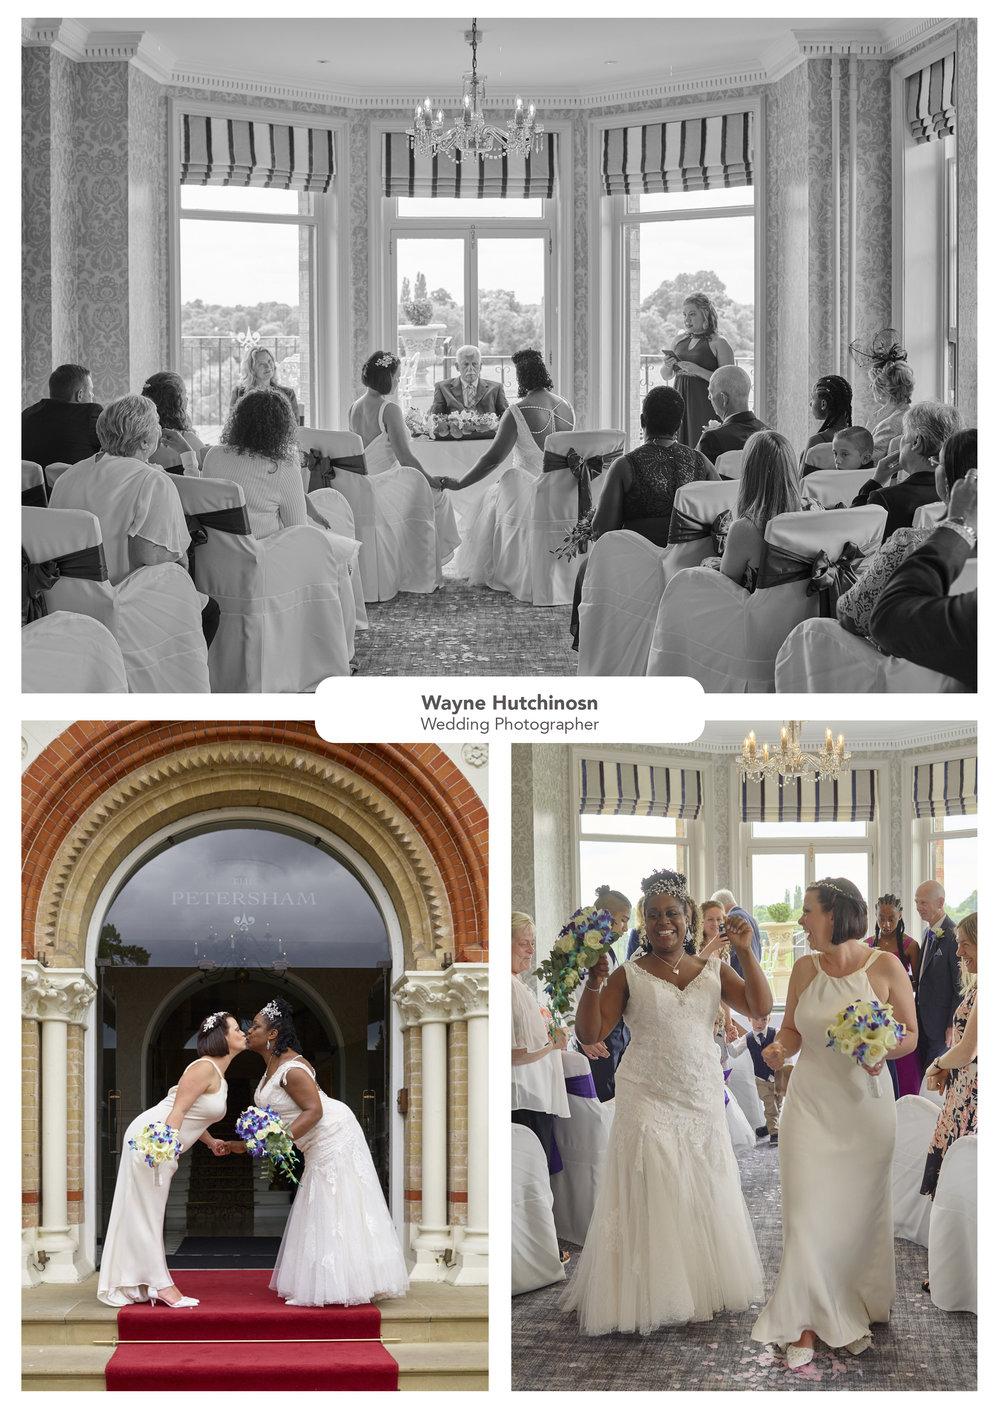 whp wedding 03.jpg